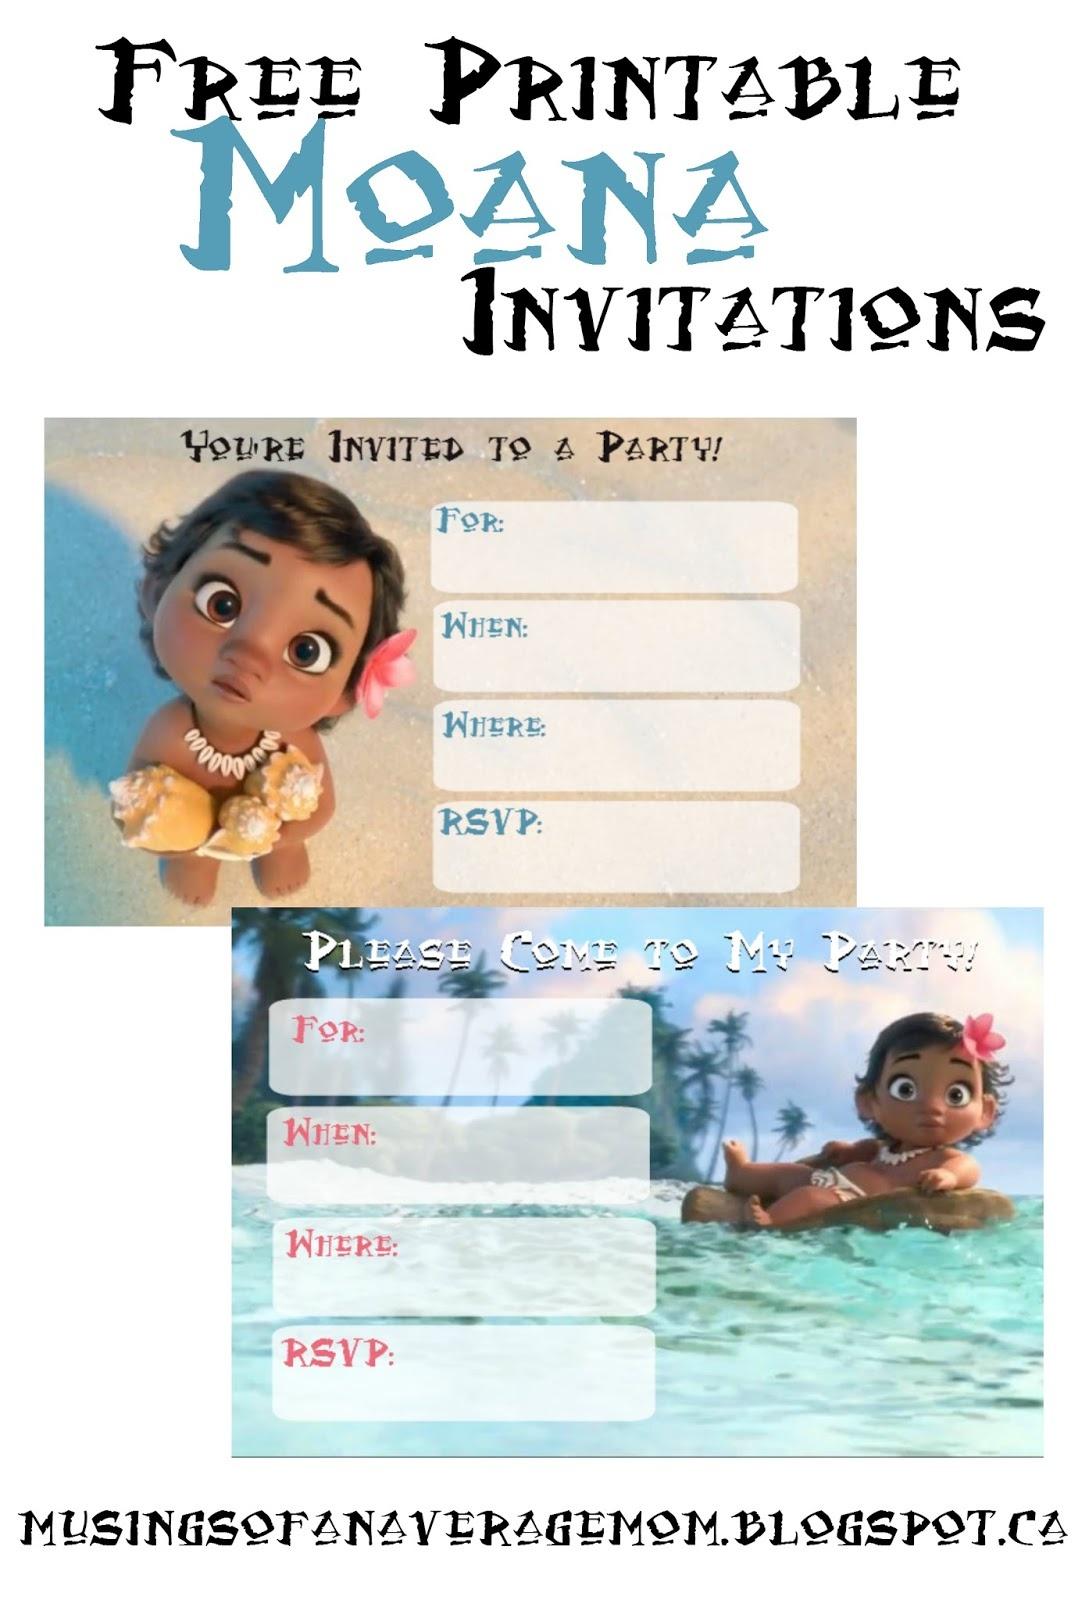 Musings Of An Average Mom: Free Printable Moana Invitations - Free Printable Moana Invitations